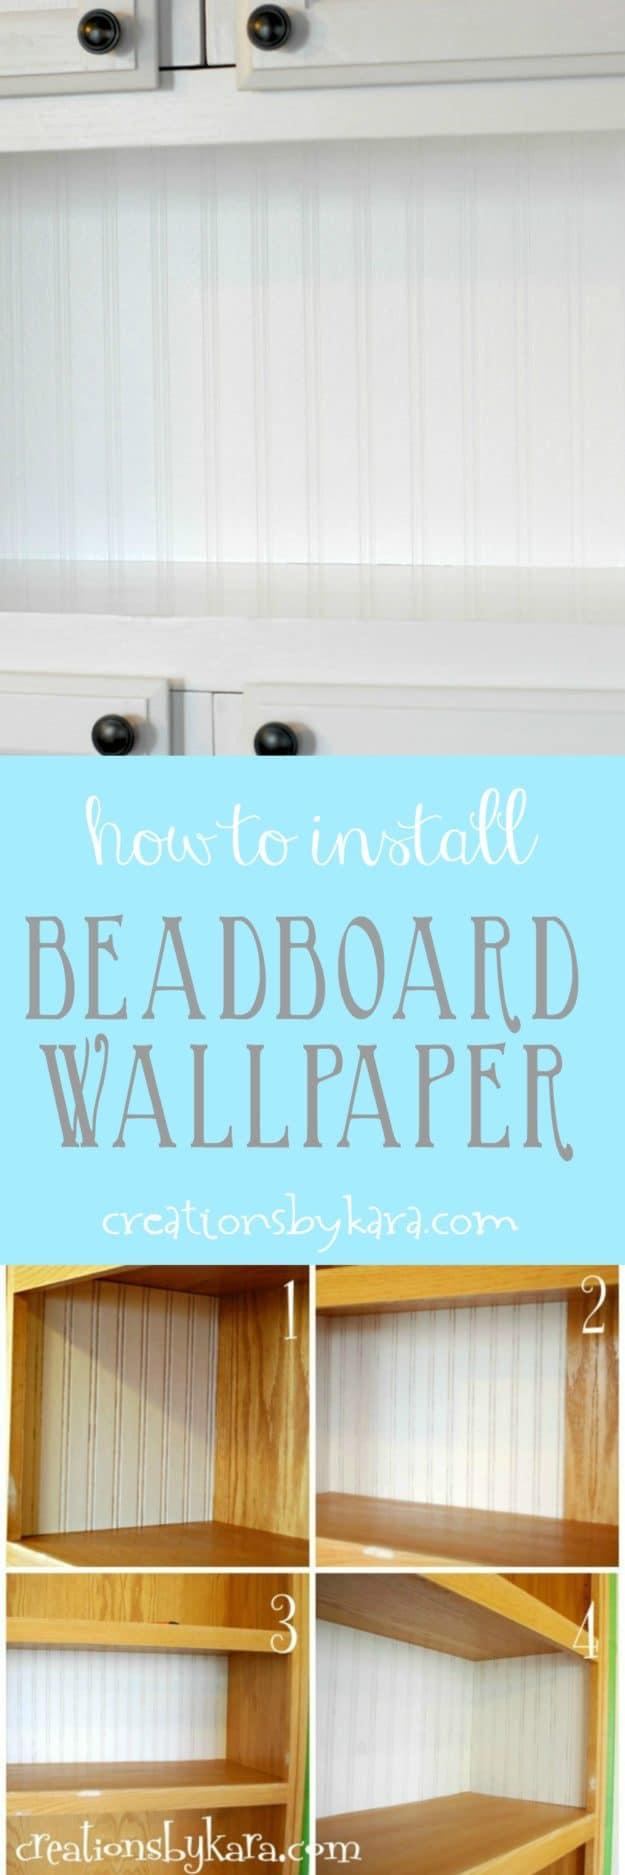 Where To Buy Beadboard Wallpaper